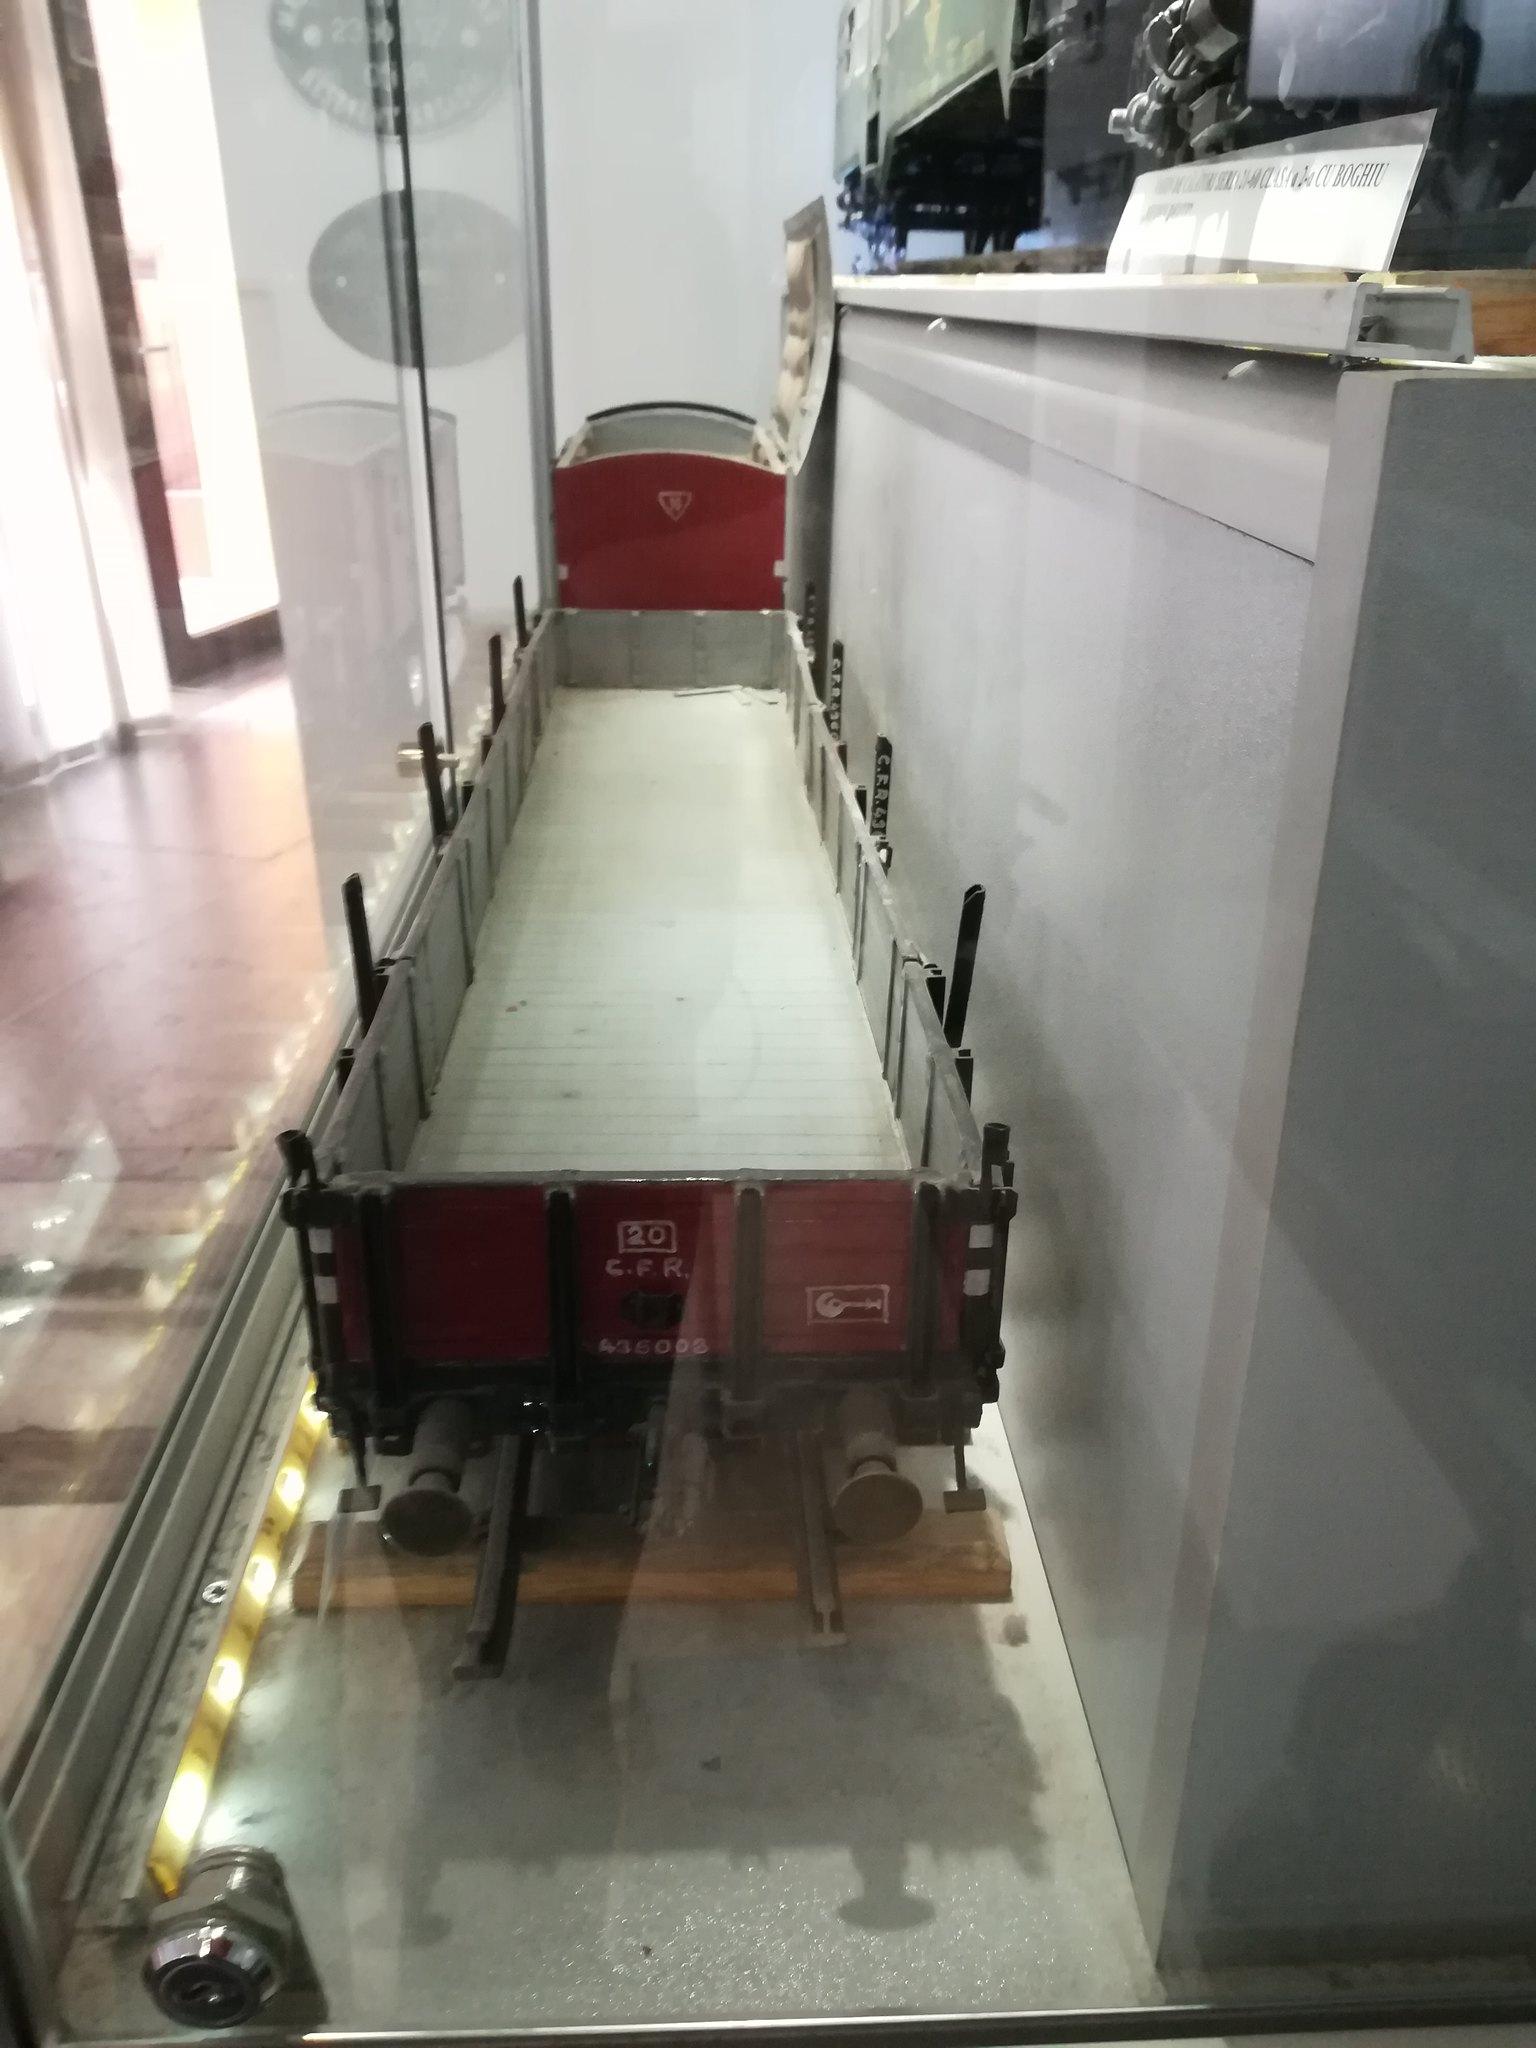 Reportaje feroviare Adirmvl - Pagina 21 49596384598_e20d7d3f3c_k